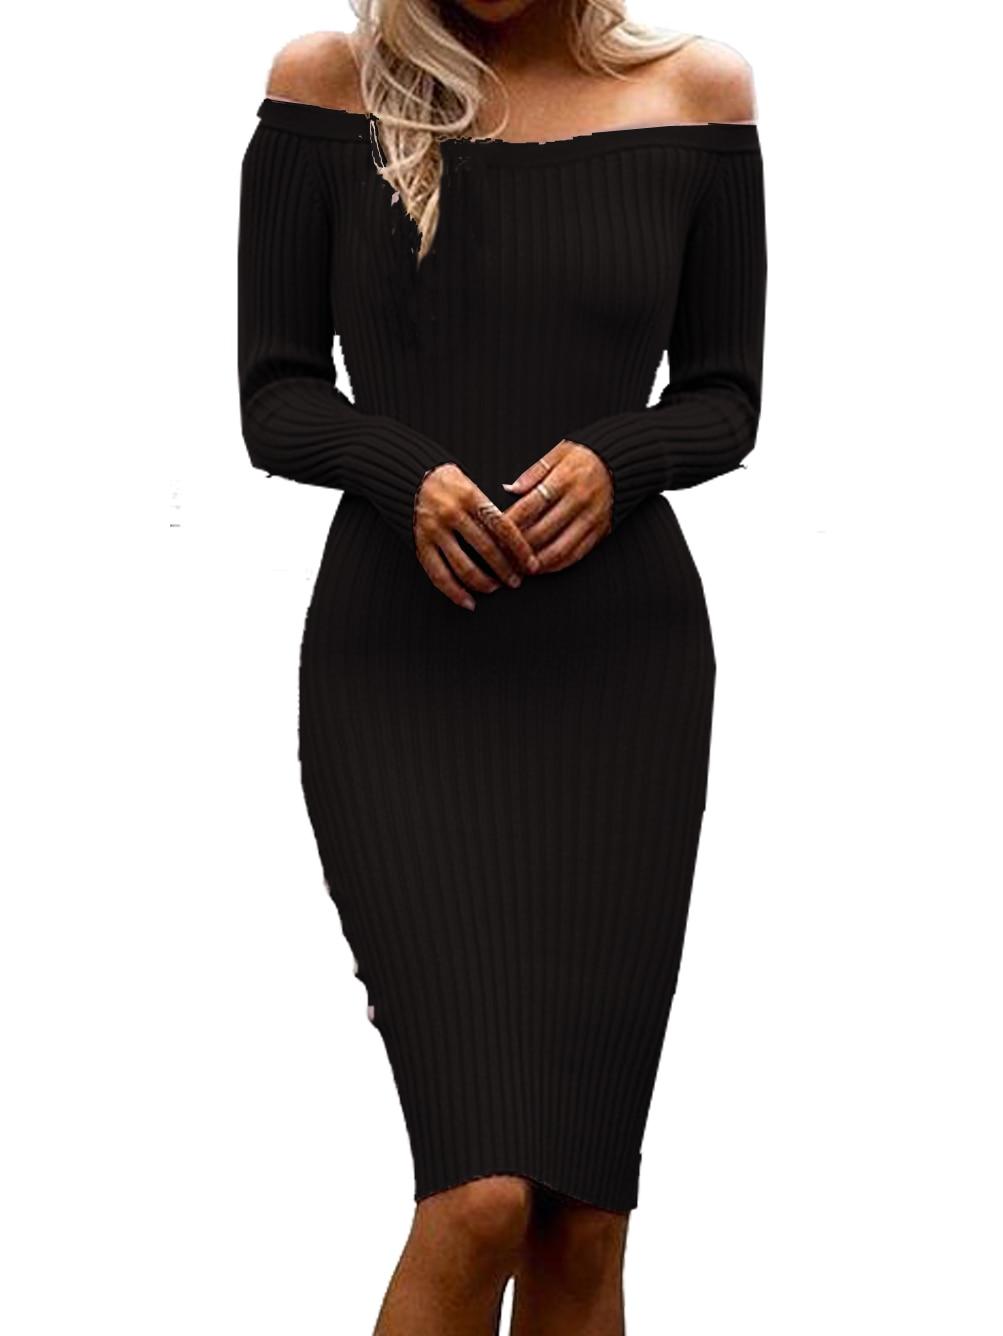 Off The Shoulder Dresses Women Knitted Long Sleeve Black Bodycon Dress Slim Stretch Winter Dresses Women 2016 Black Friday New cute off the shoulder lemon dress for women